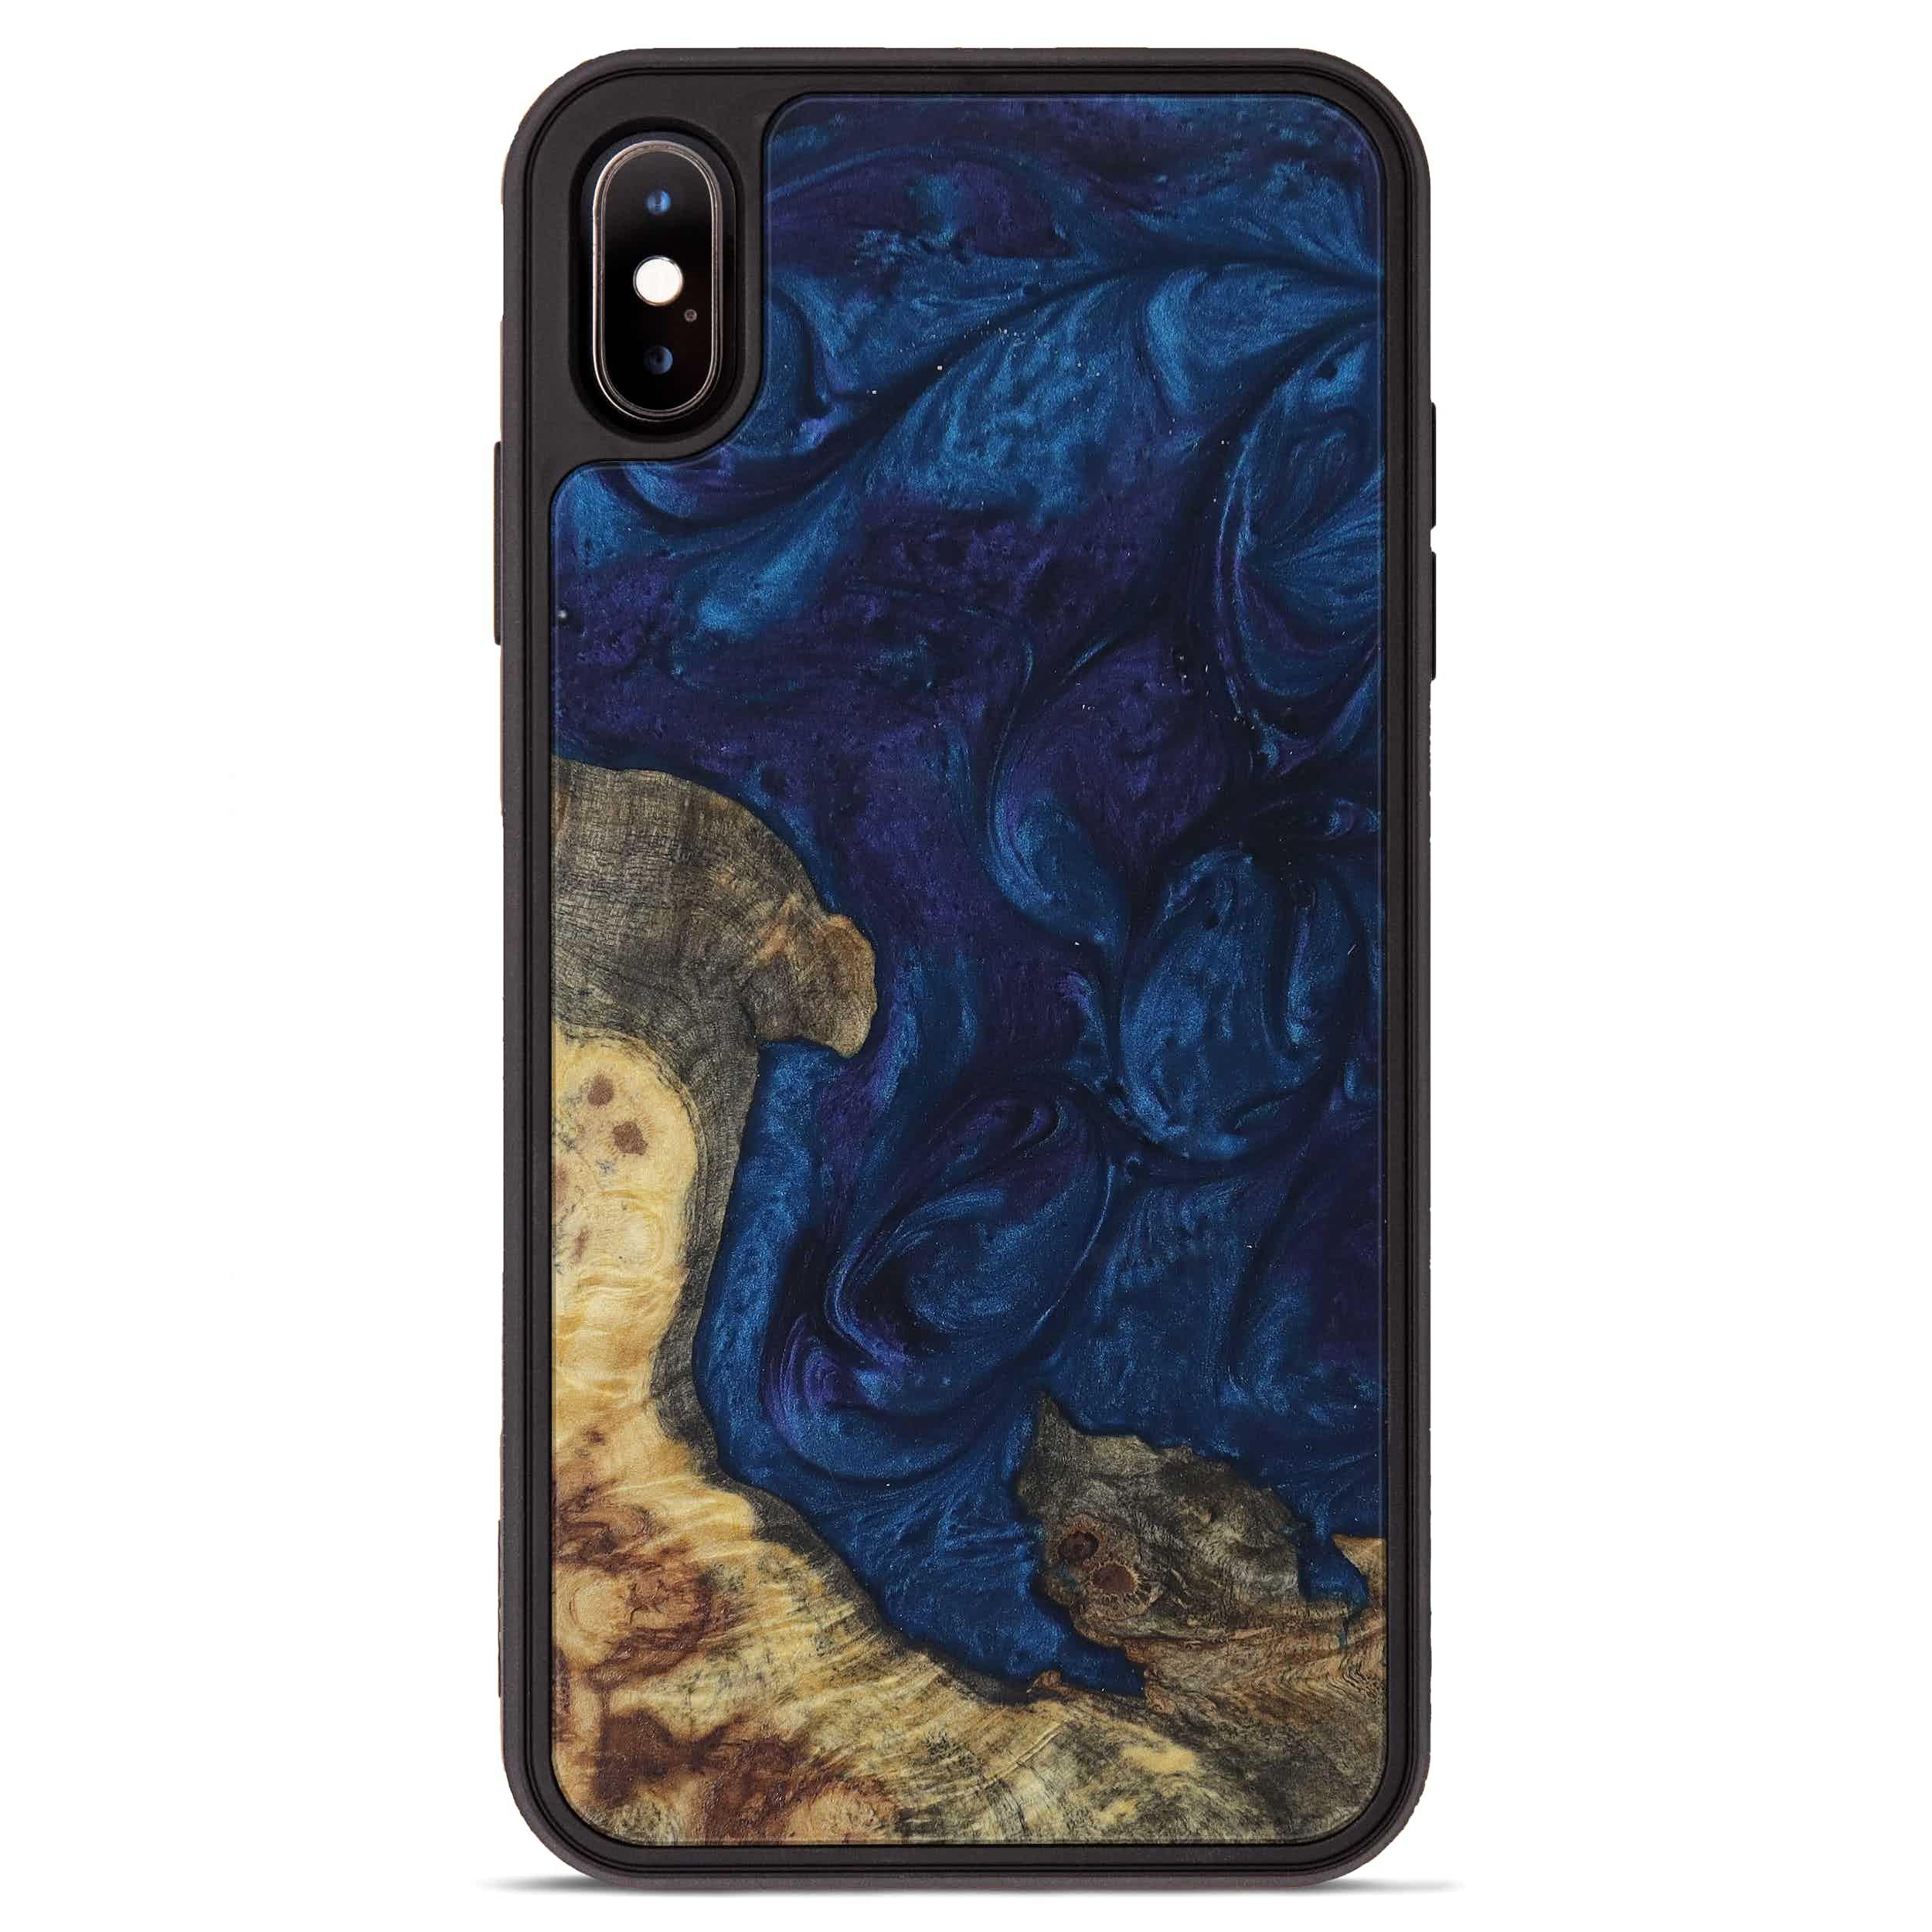 iPhone Xs Max Wood+Resin Phone Case - Ilse (Dark Blue, 394718)